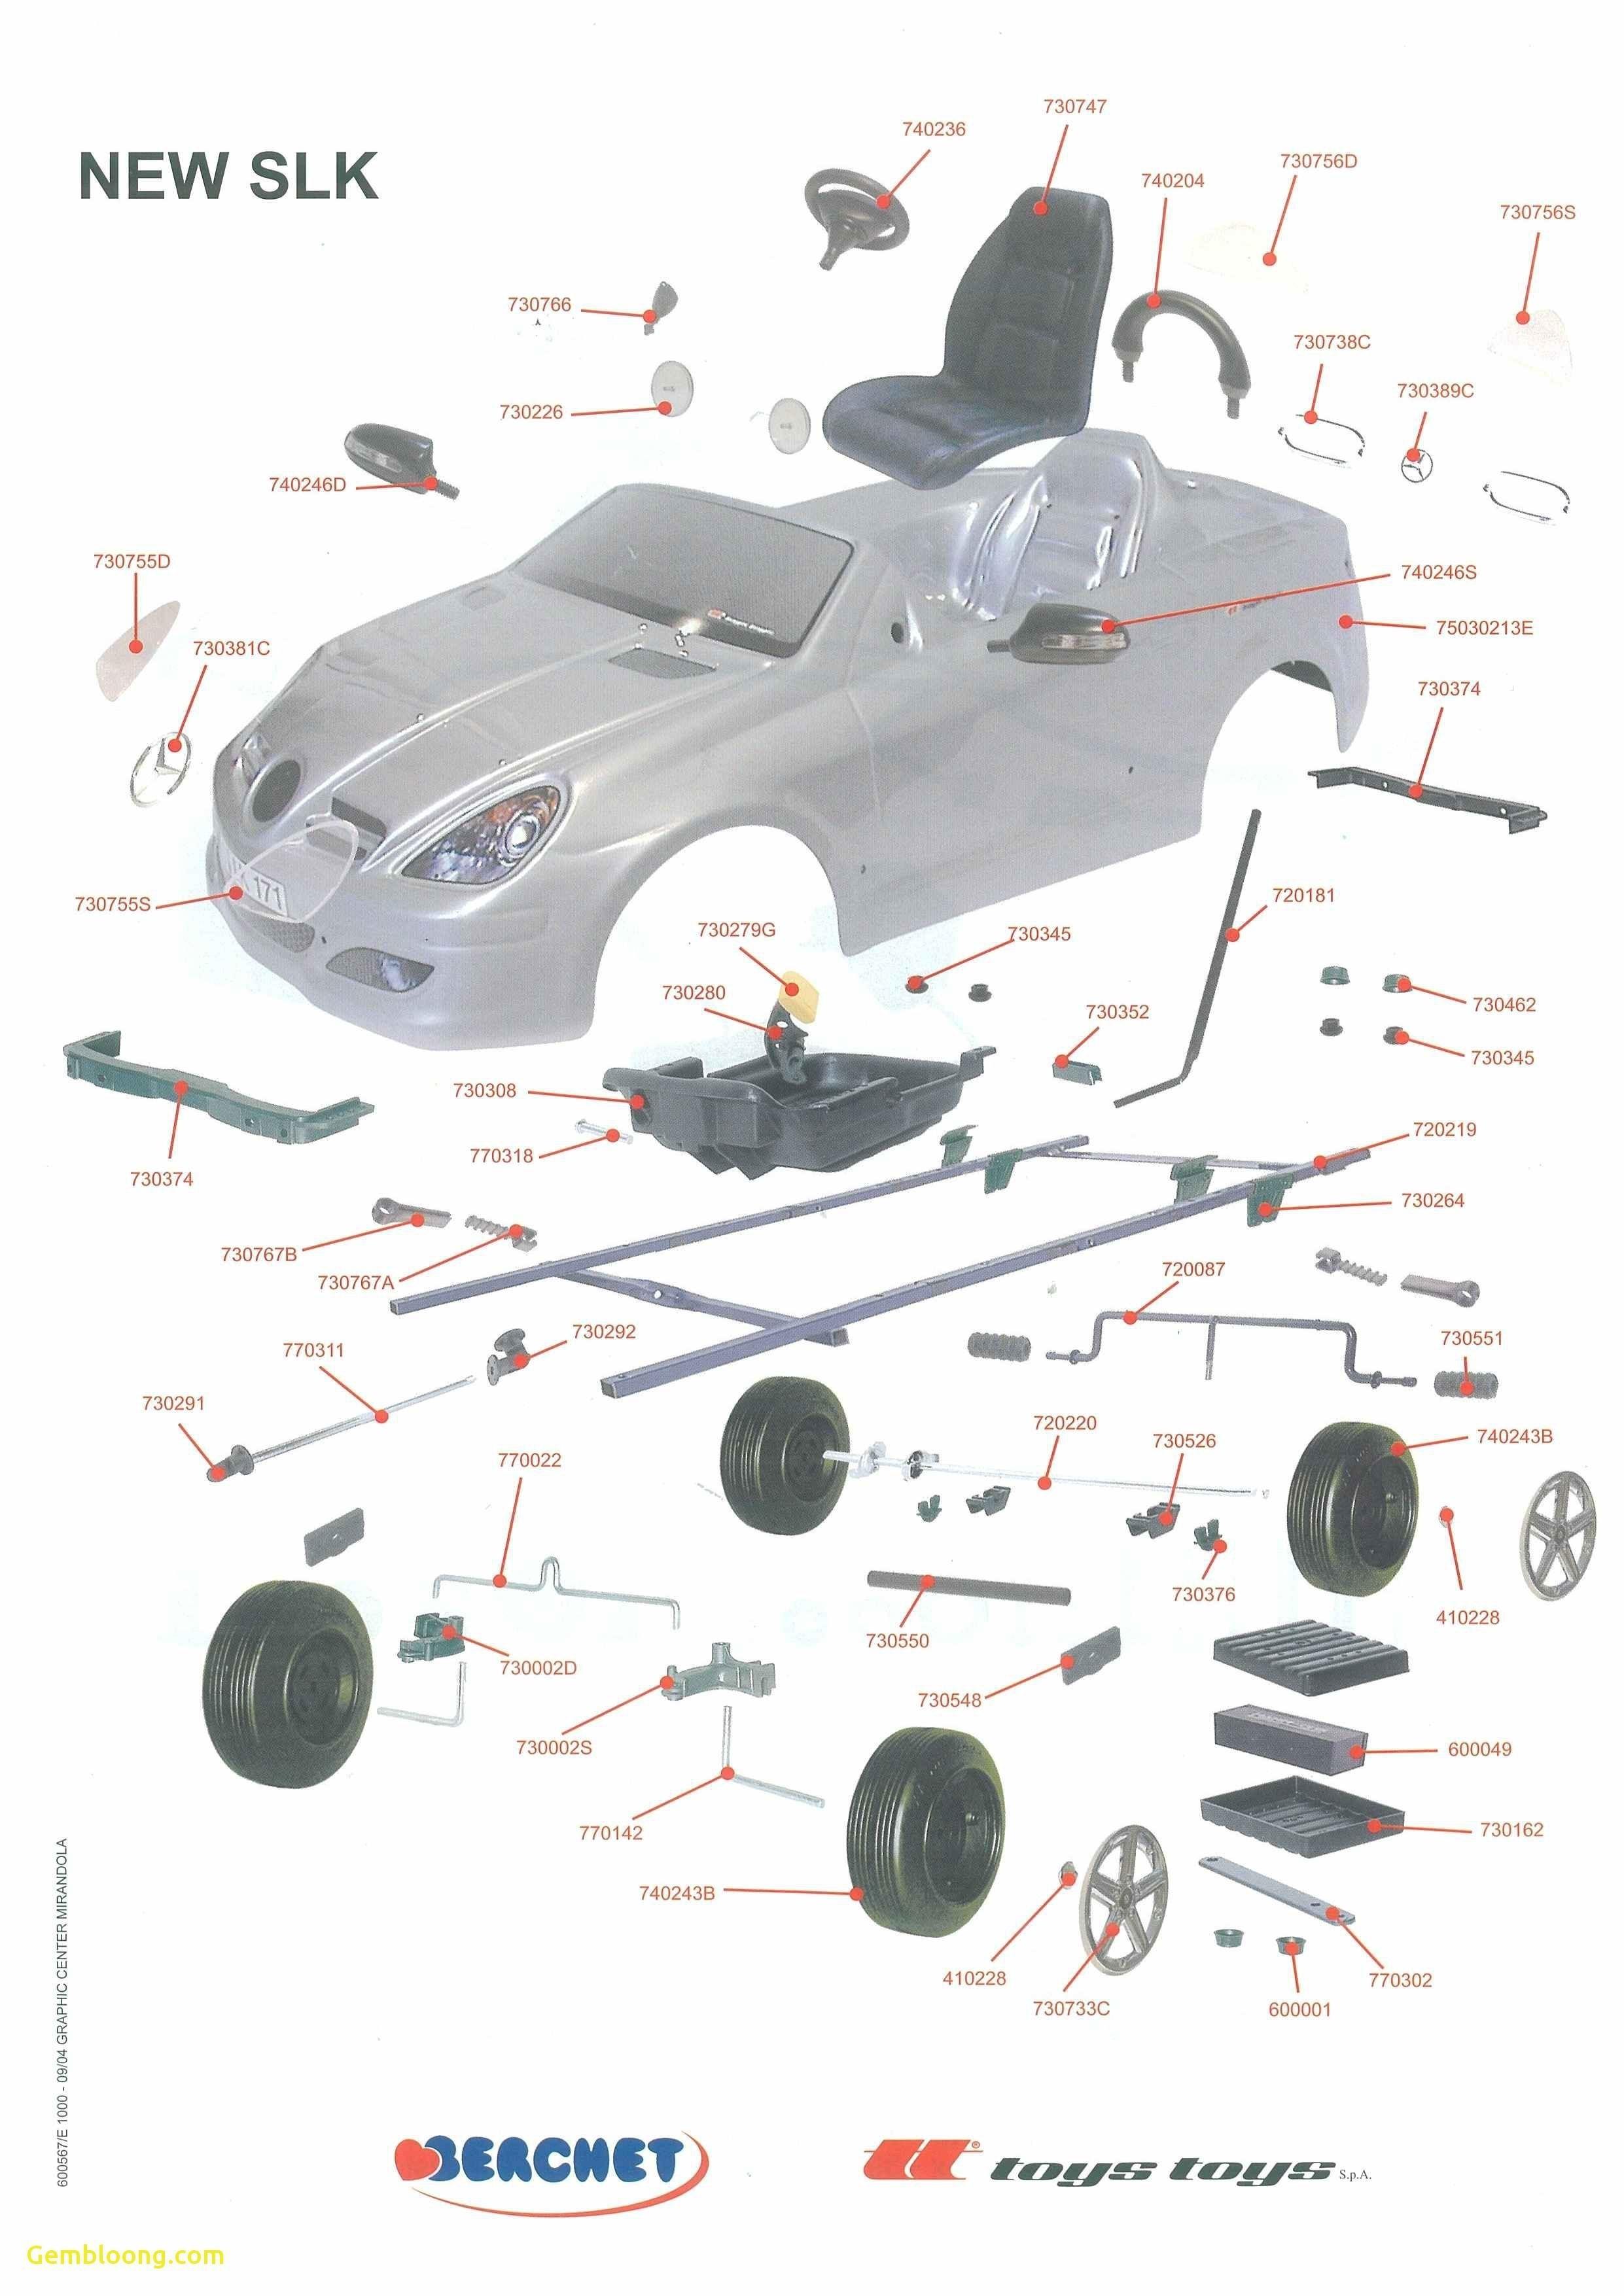 Body Part Names Diagram Camry Car - Wiring Diagram •